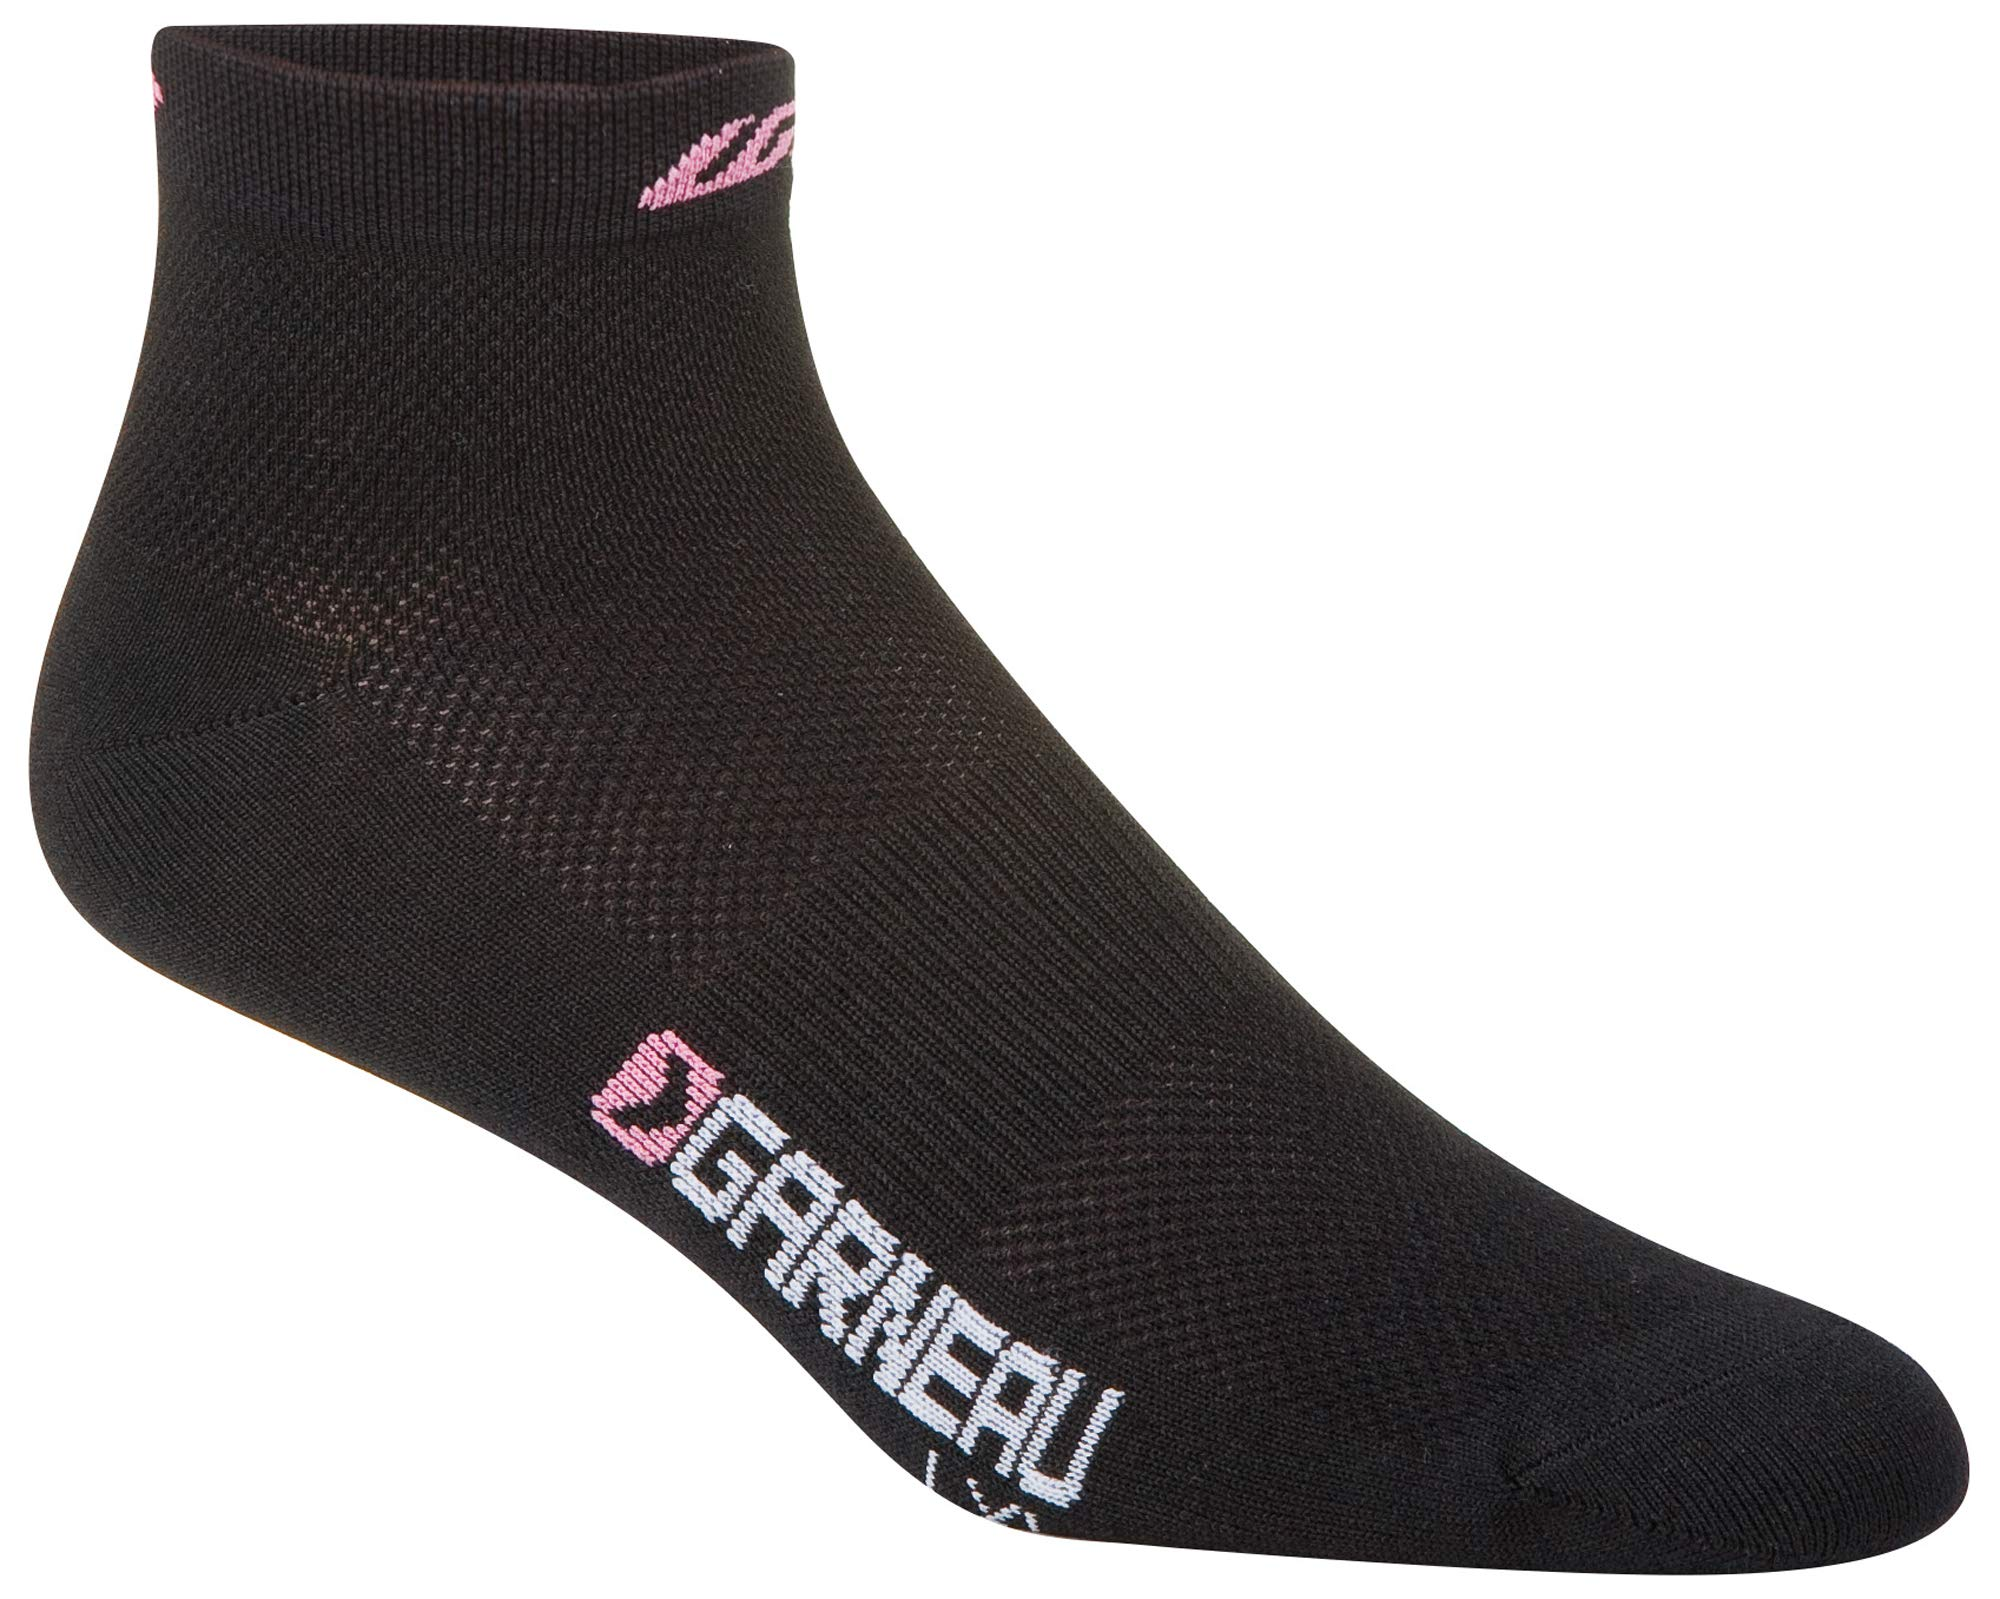 Louis Garneau Women's Low Versis Lightweight, Moisture Wicking Cycling Socks Cycling Socks 3-Pack, Rose Drummond, Large/X-Large by Louis Garneau